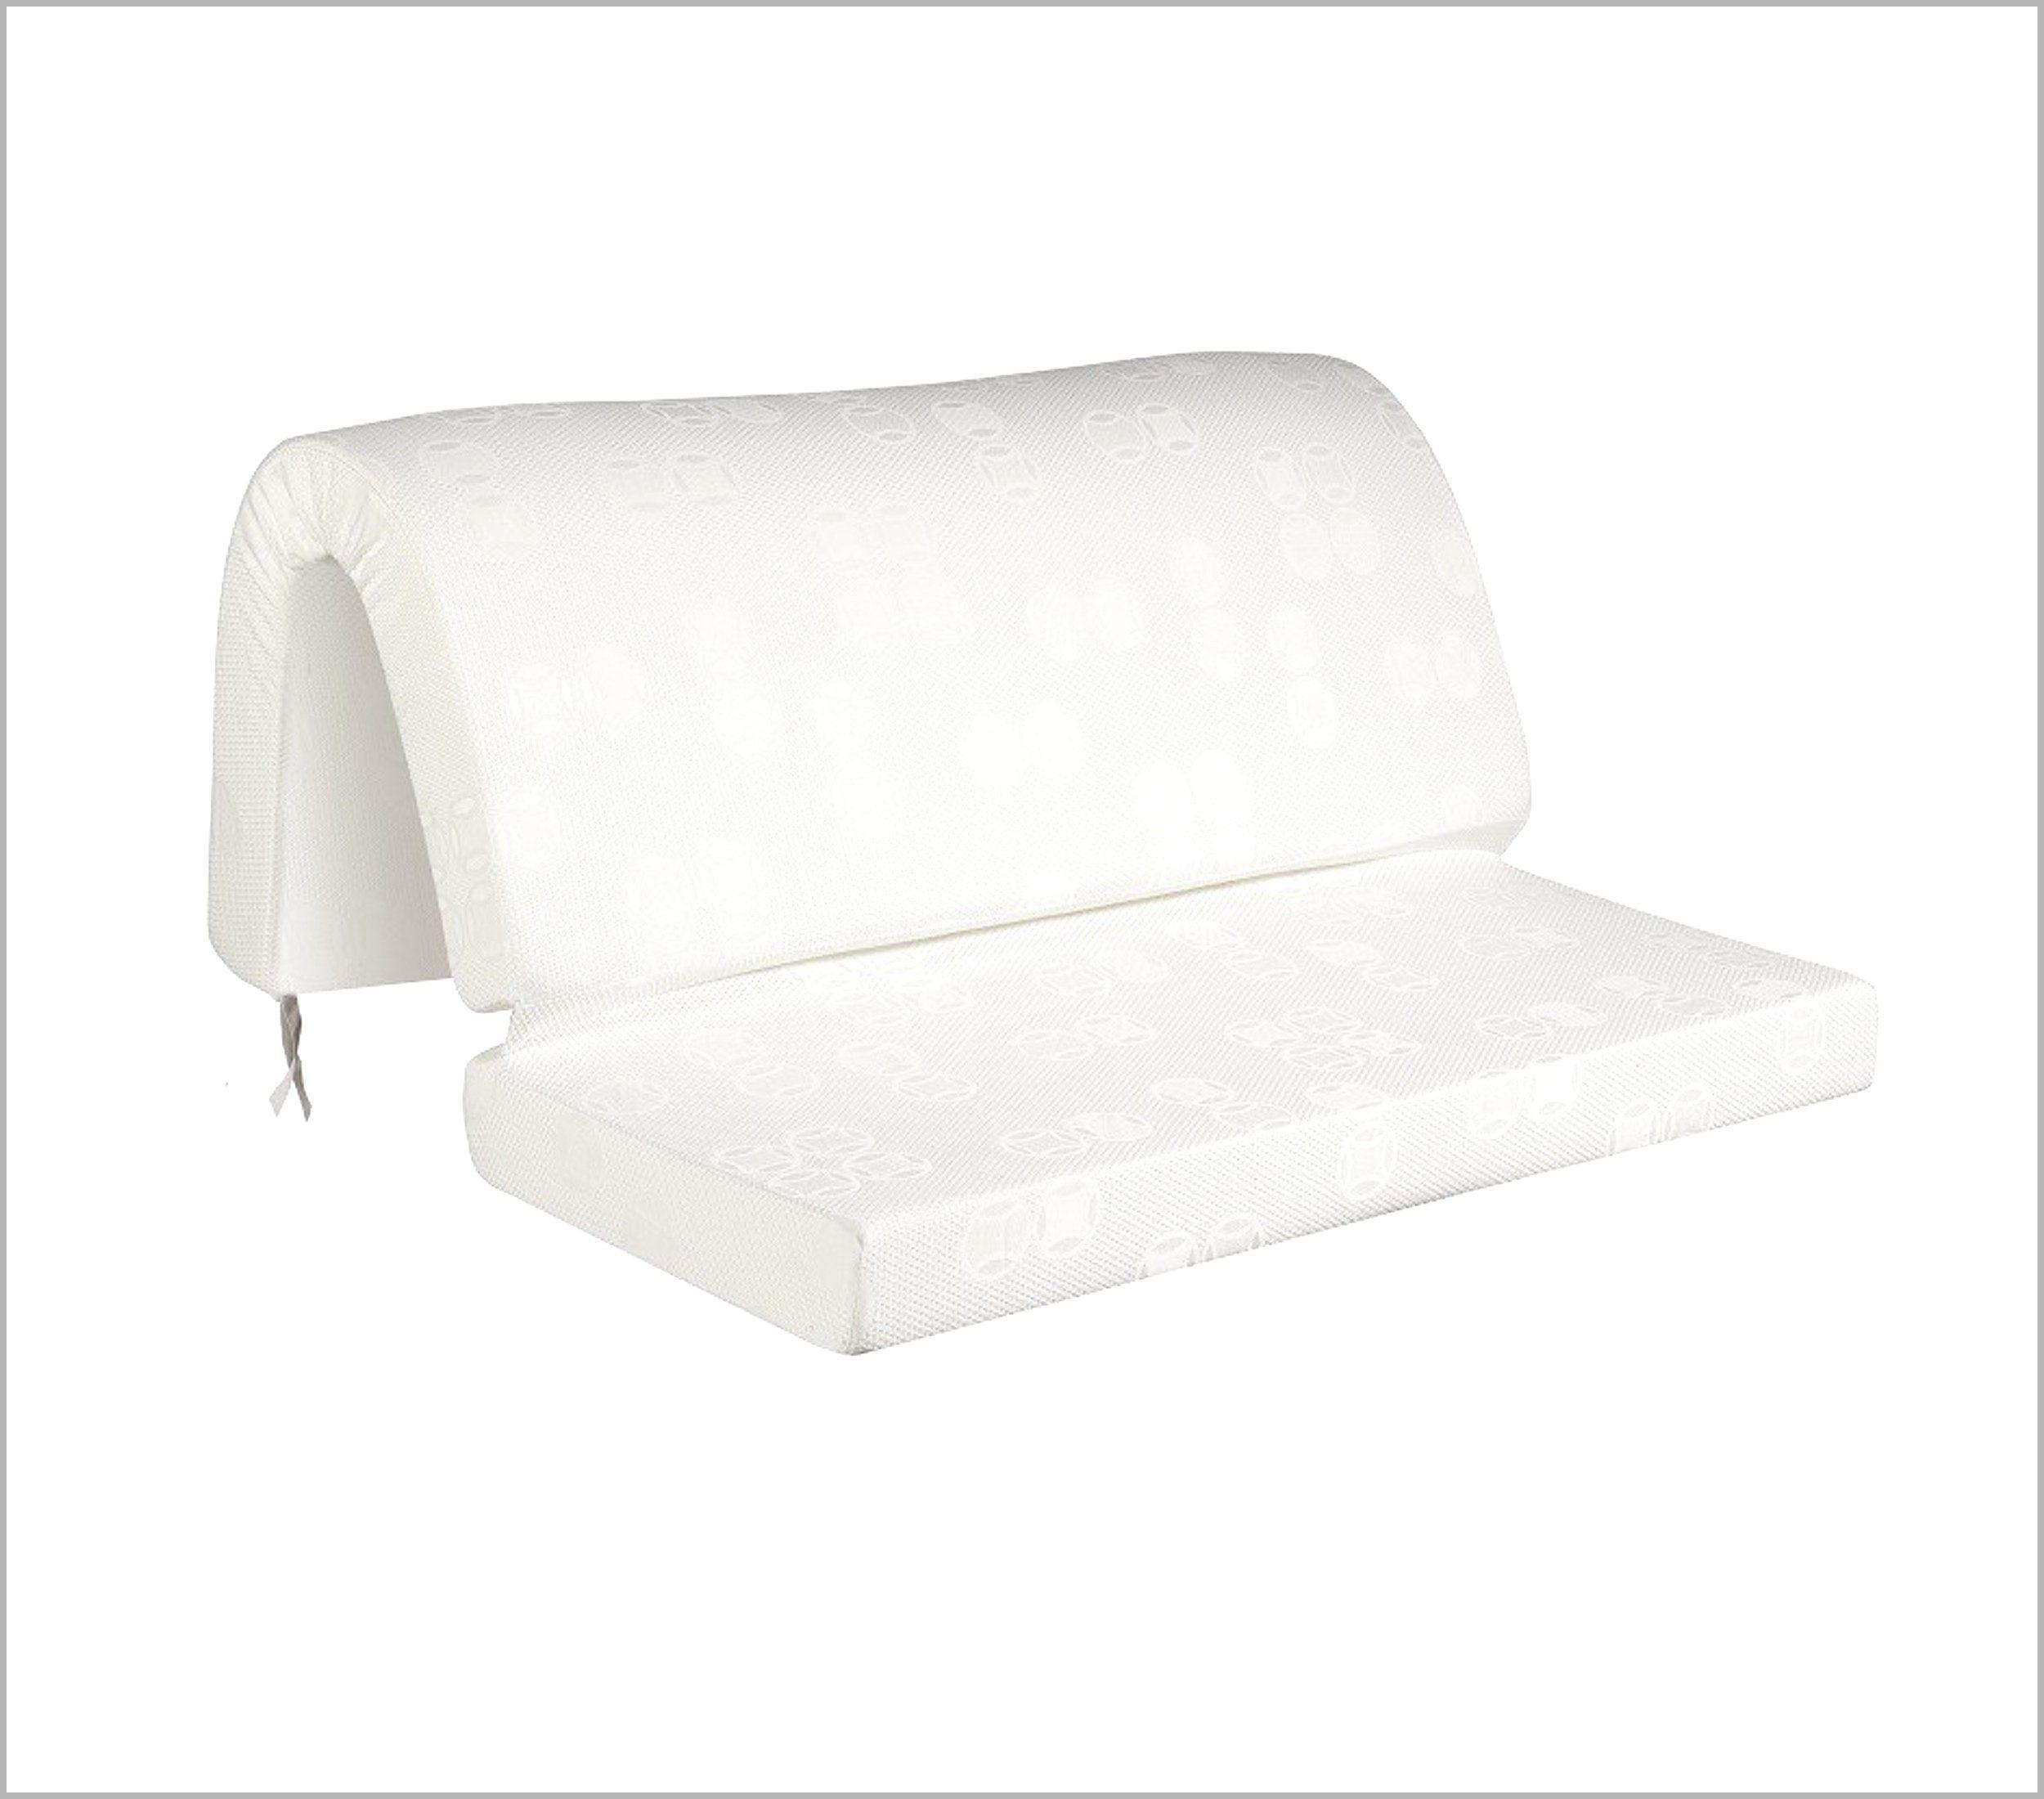 Matelas Intex Intex Convertible Lounge Queen Size Airbed Ebay